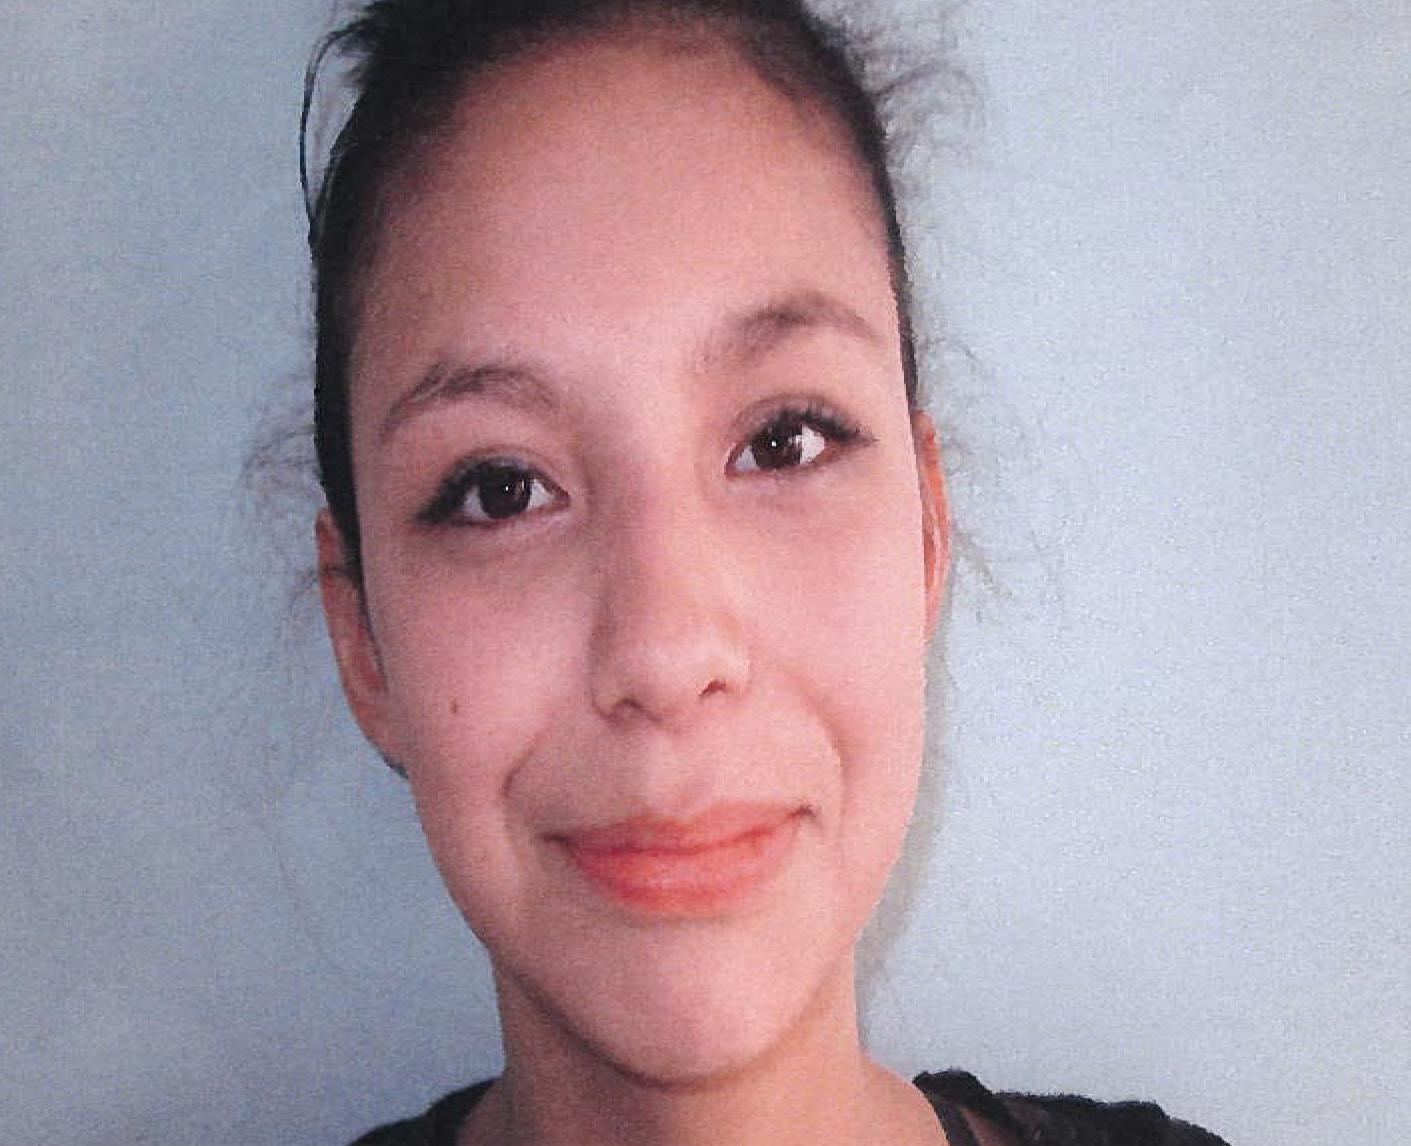 Regina police find missing teen girl